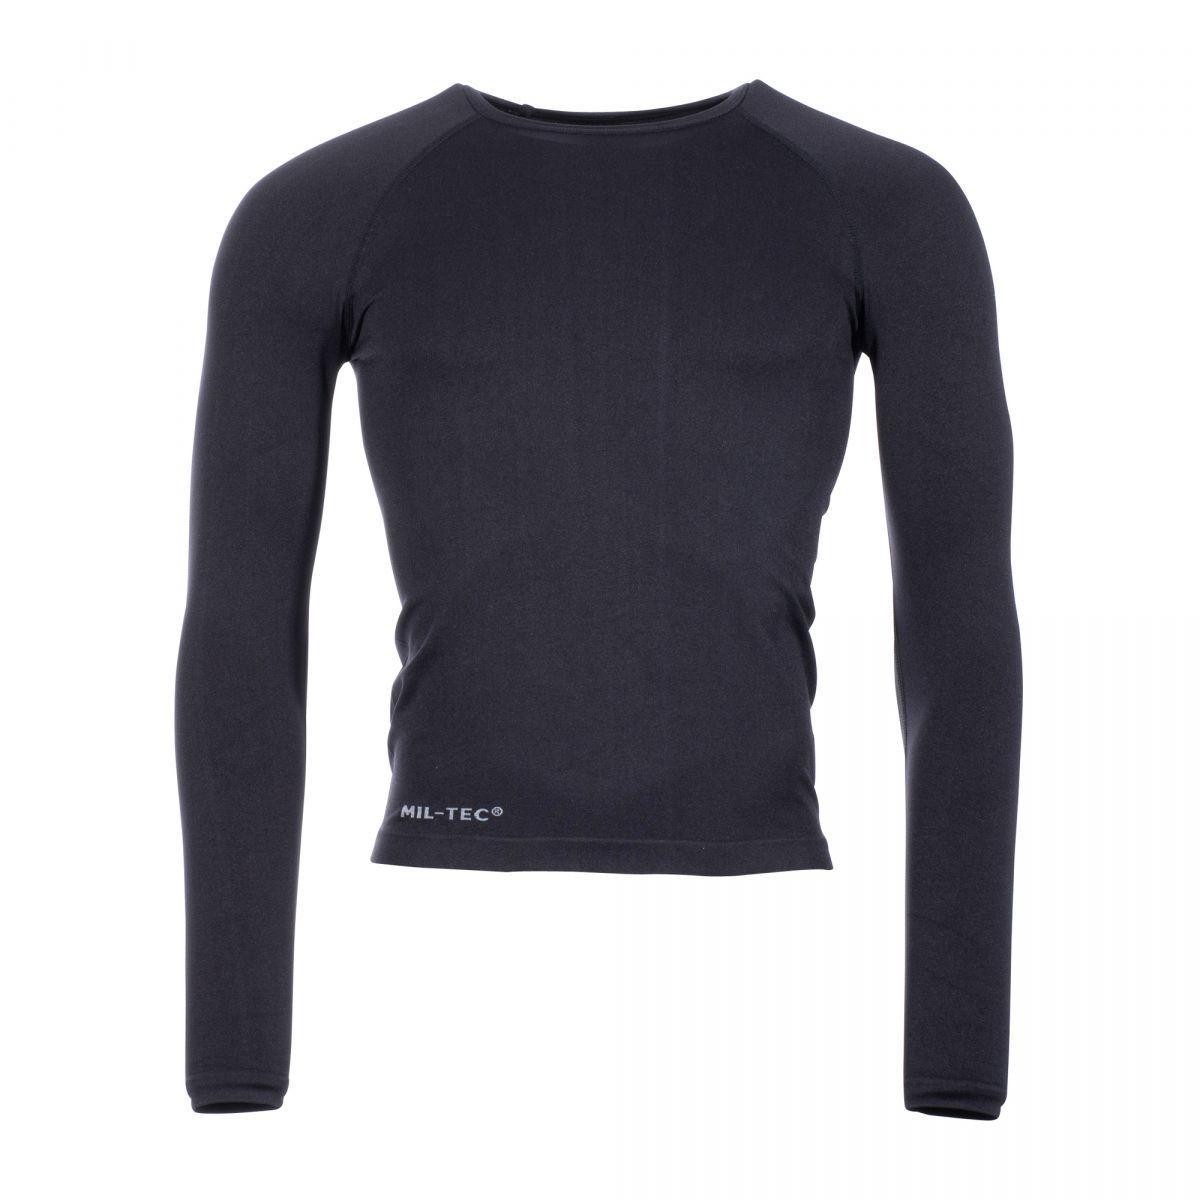 Windshirt Mil-Tec schwarz